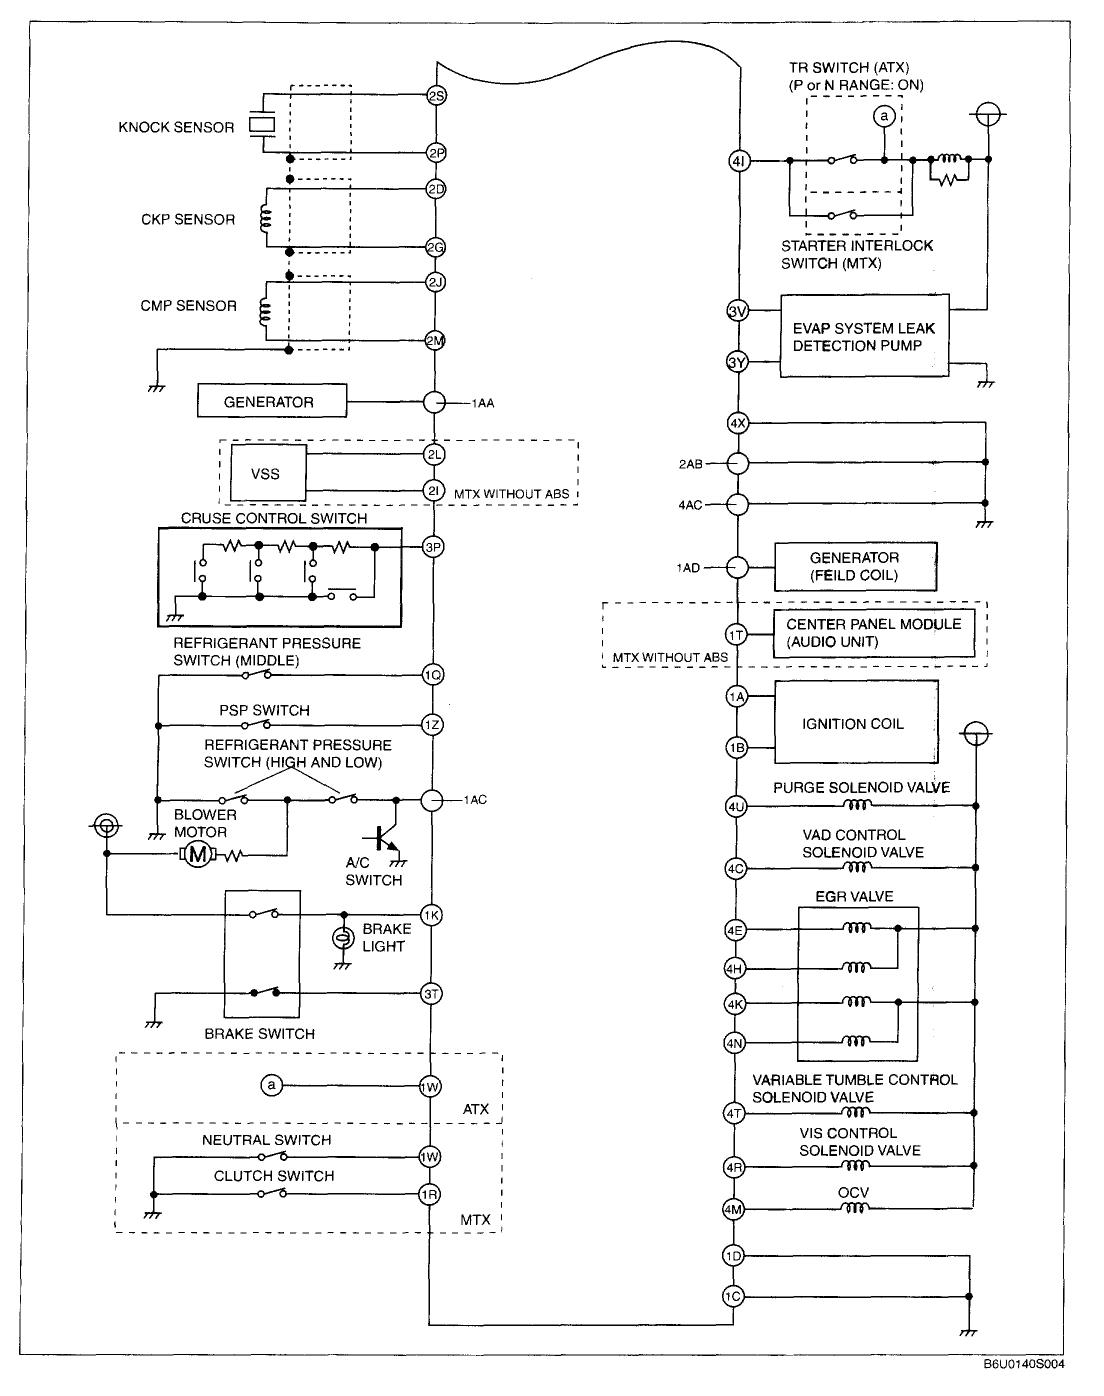 mazda 626 radio wiring harness basic electronics wiring diagram gif